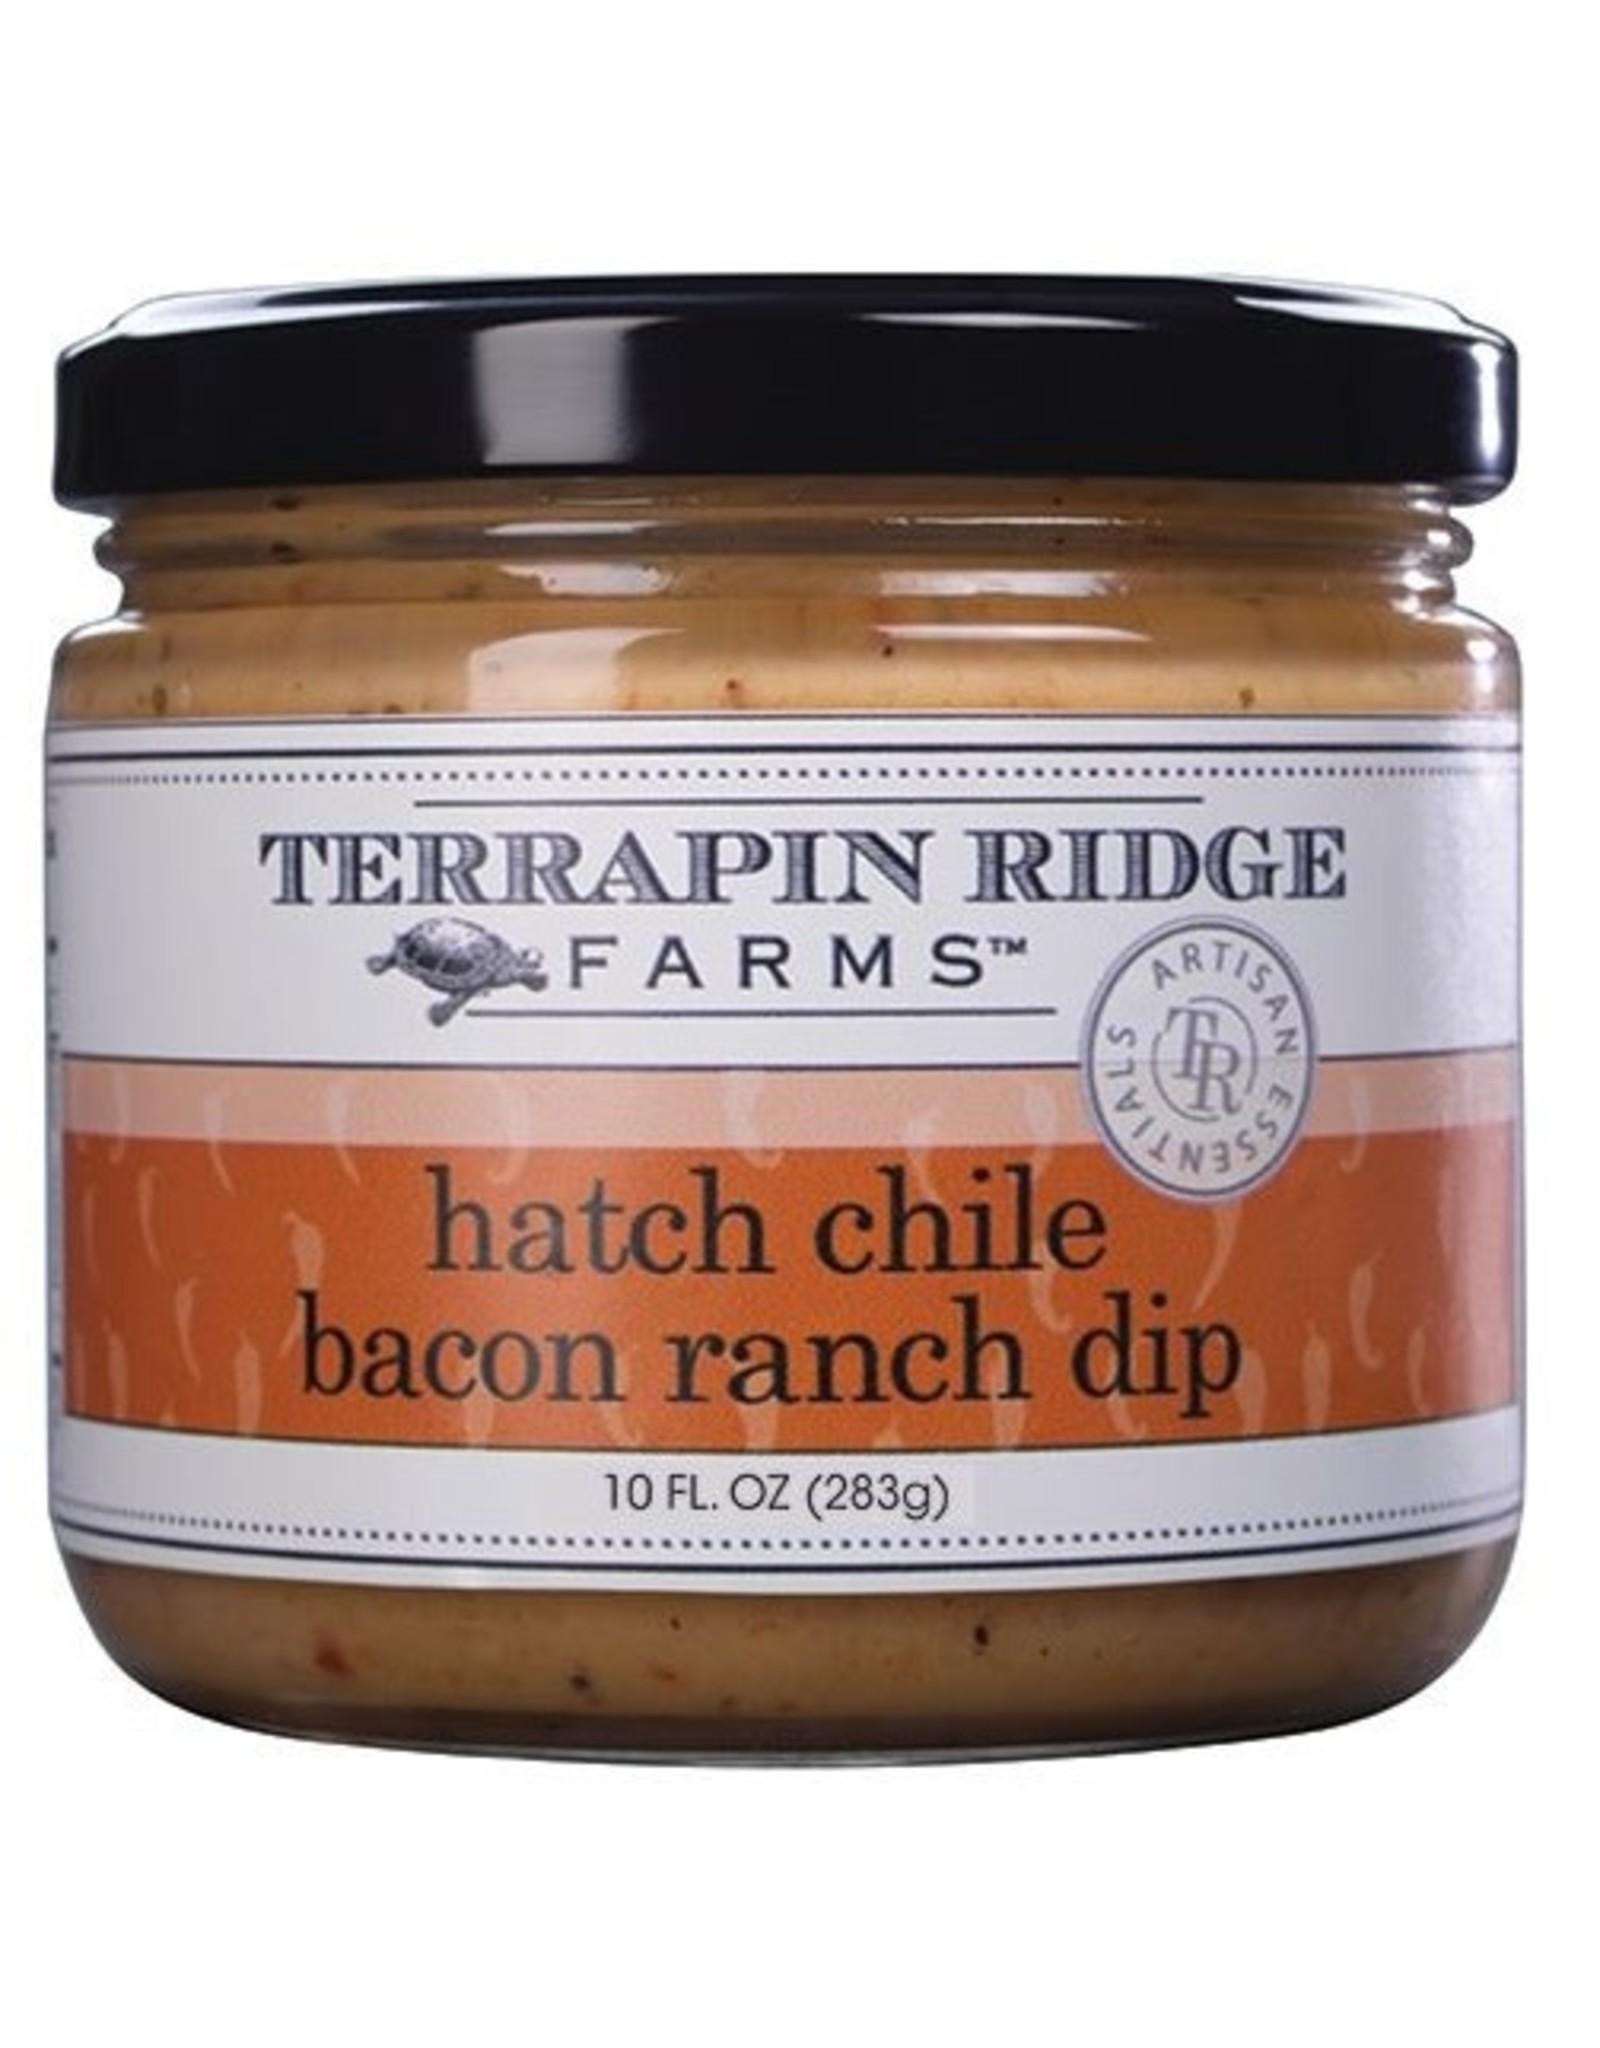 Terrapin Ridge HATCH CHILE BACON RANCH DIP